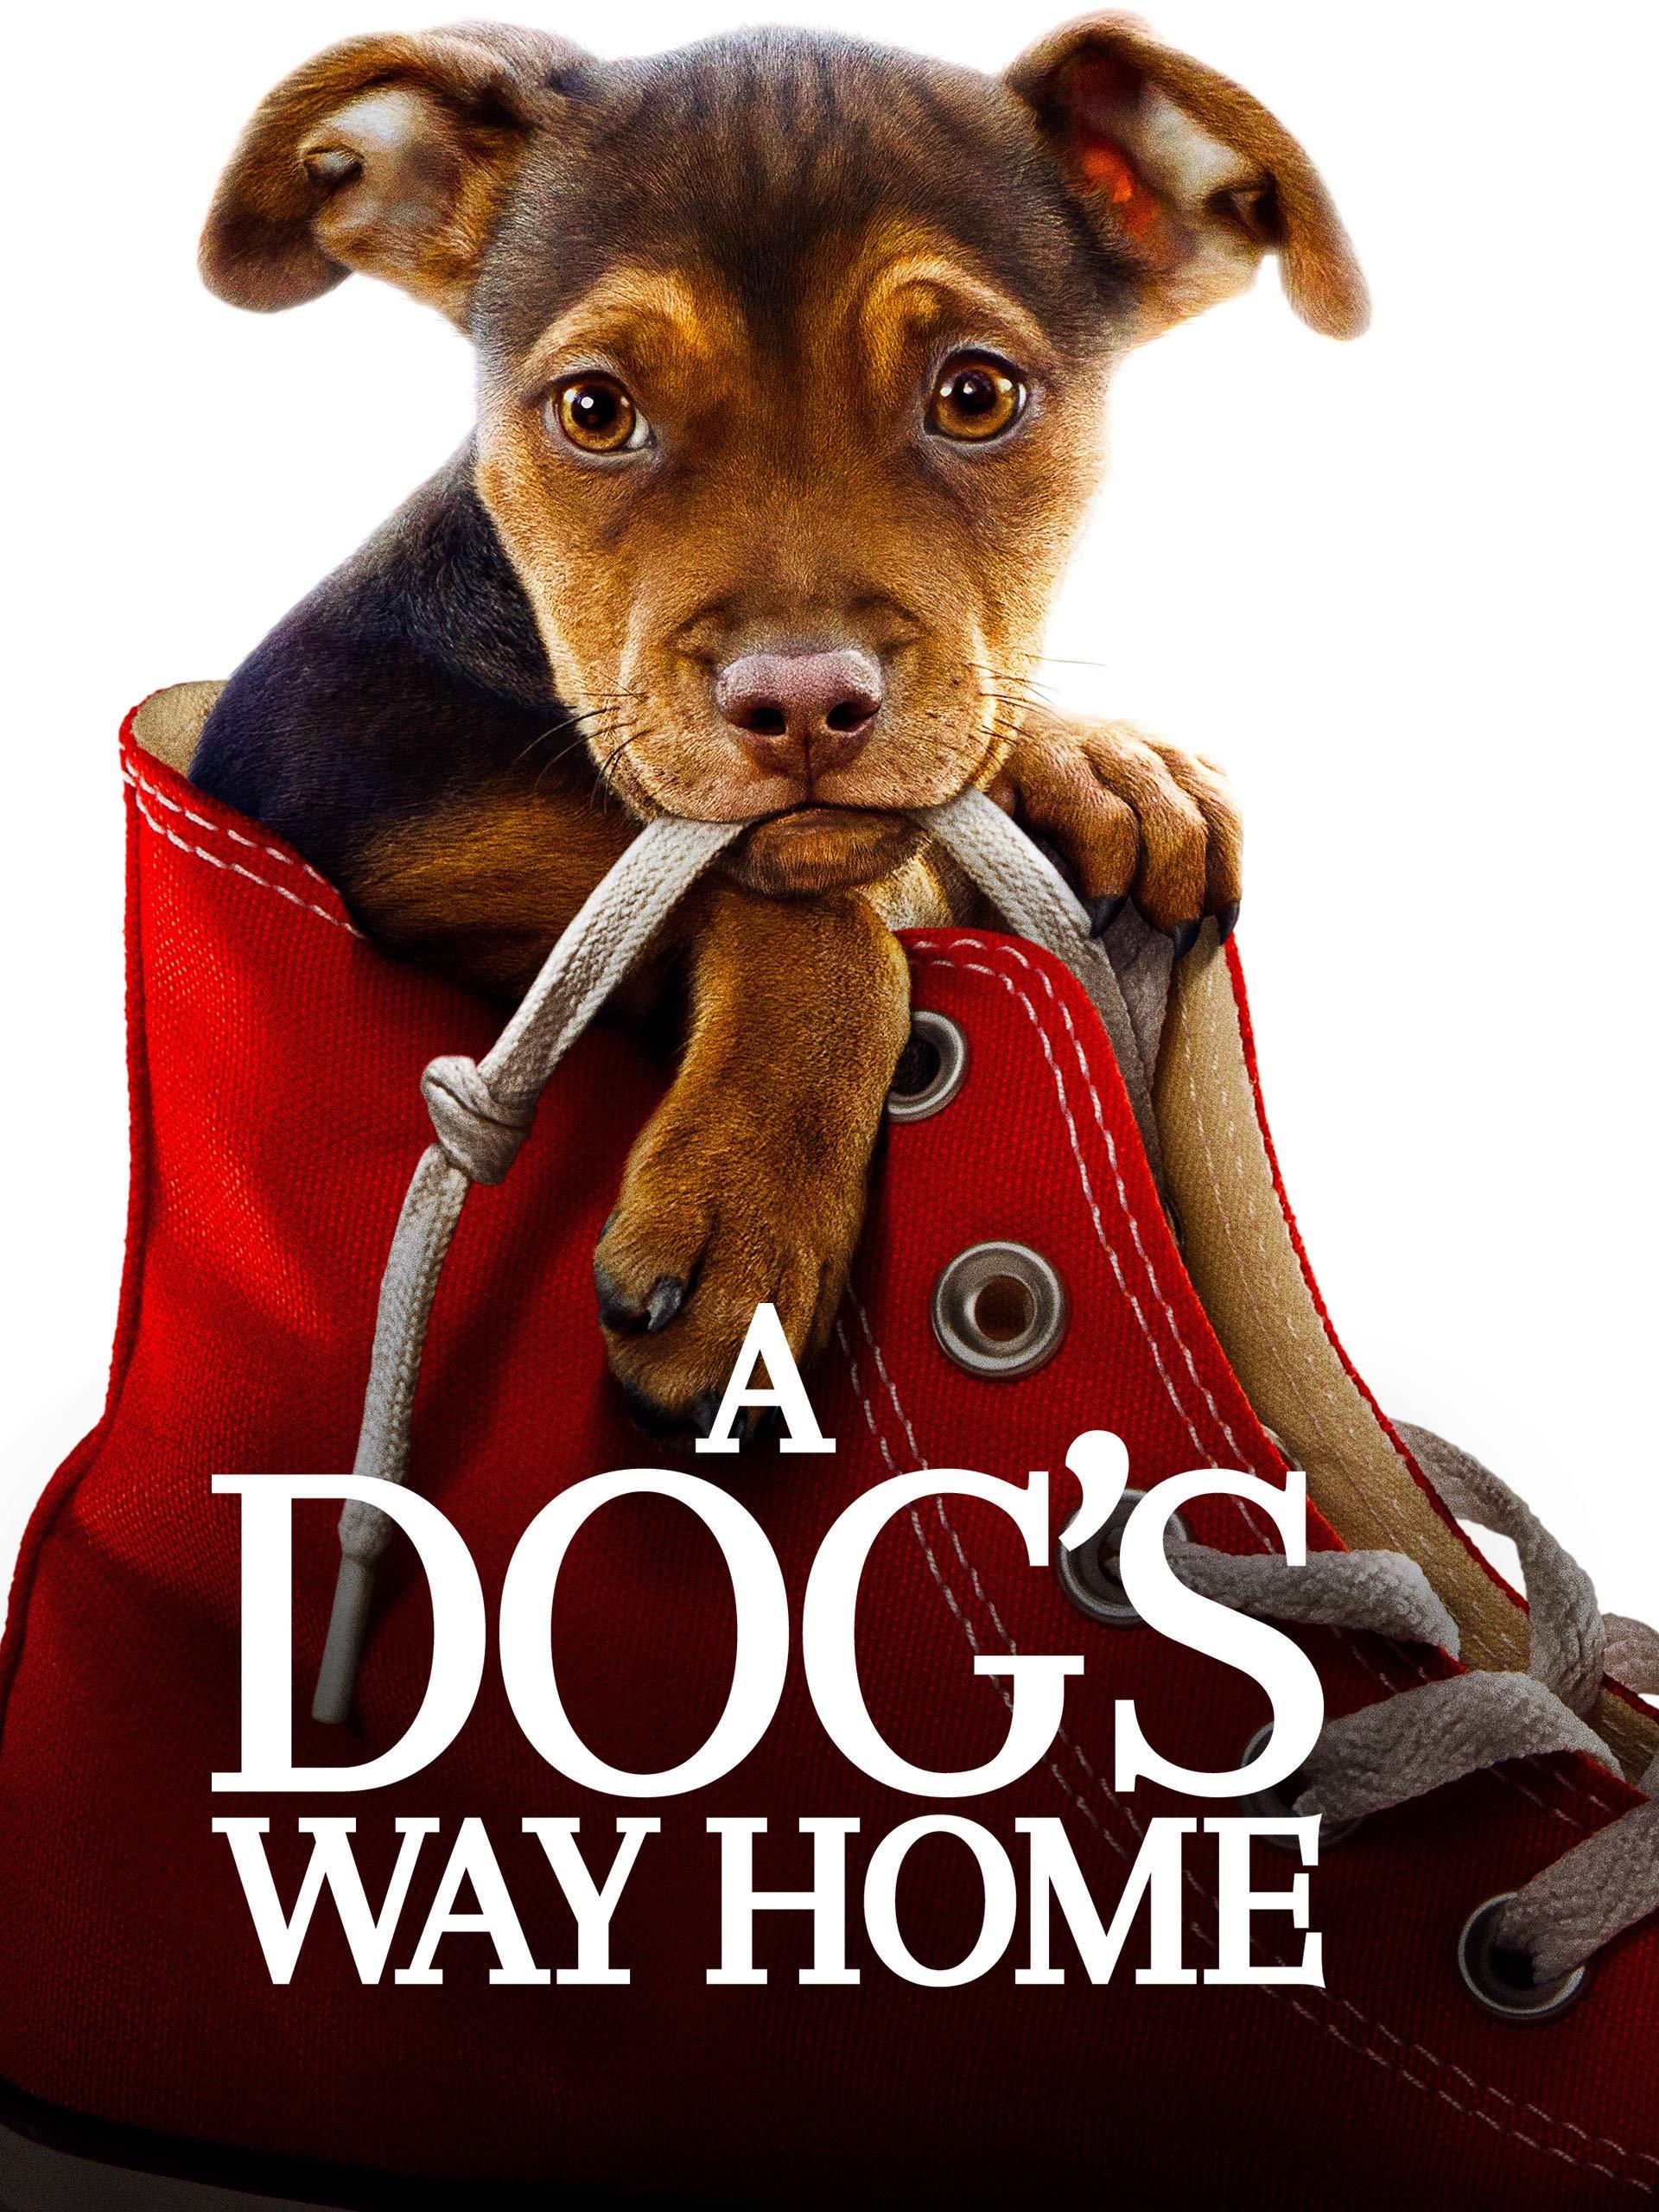 Dogs Way Home Ashley Judd